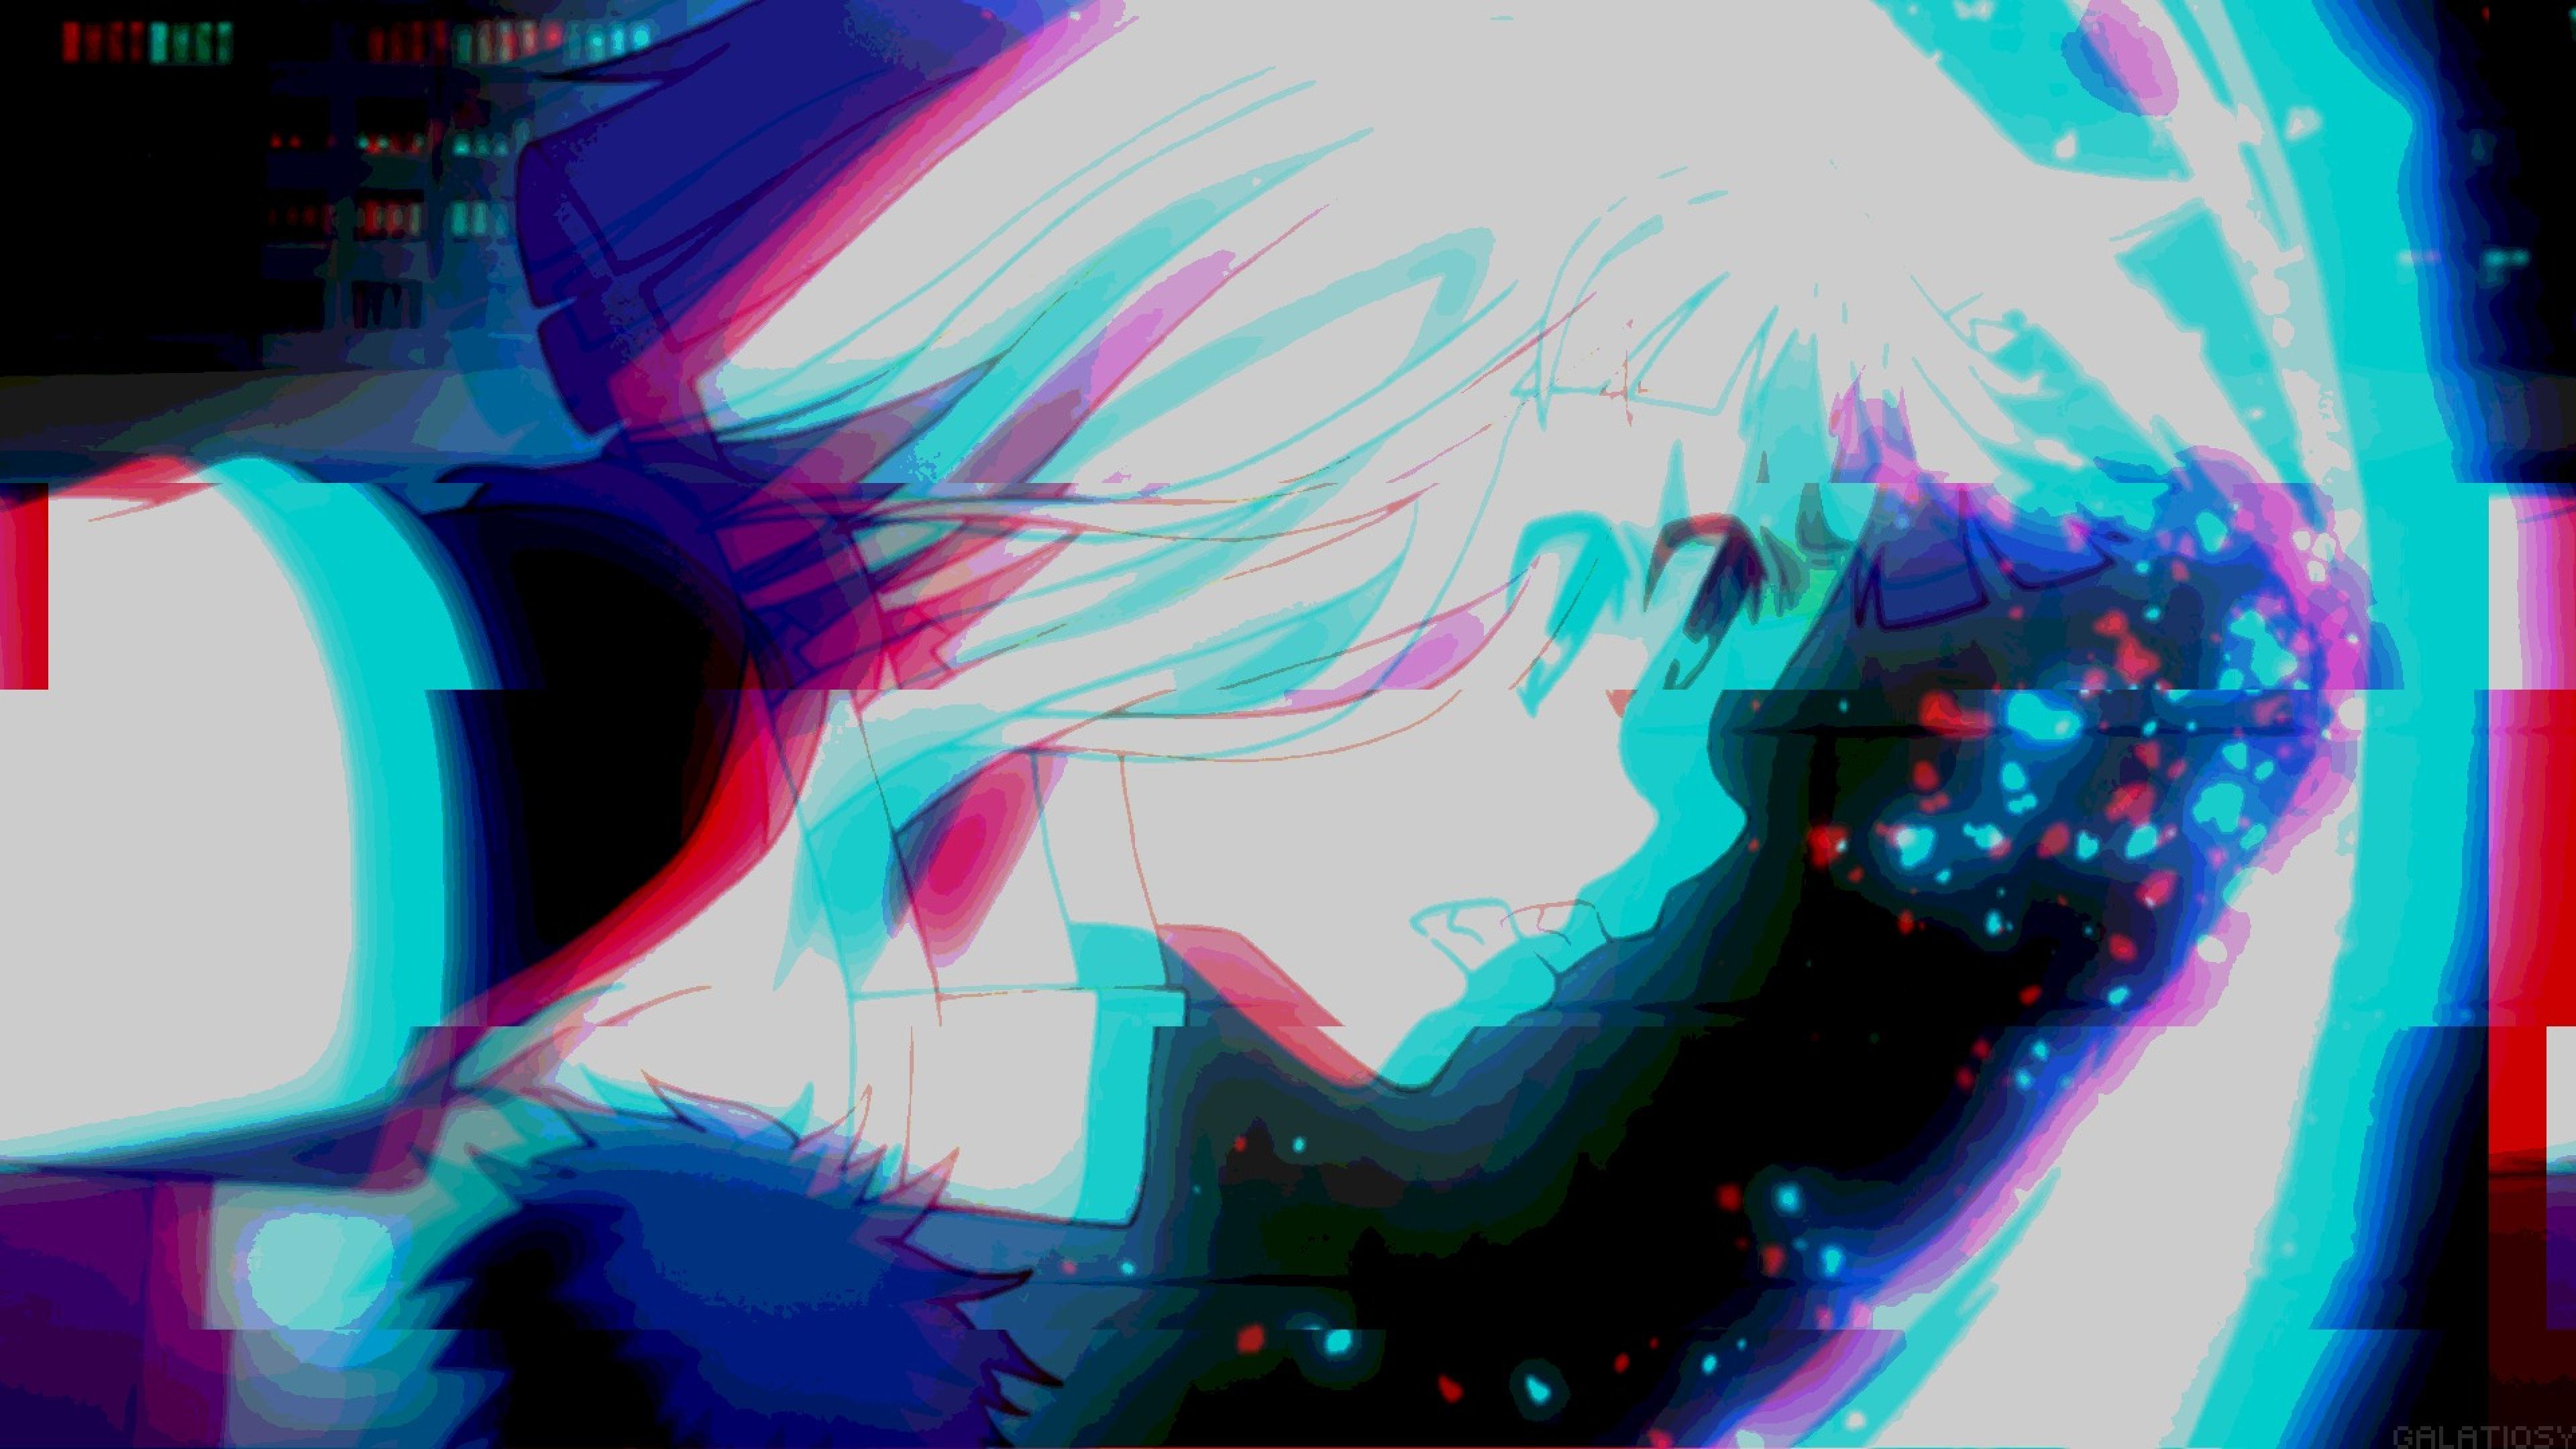 Aesthetic Anime 4k Wallpapers Wallpaper Cave